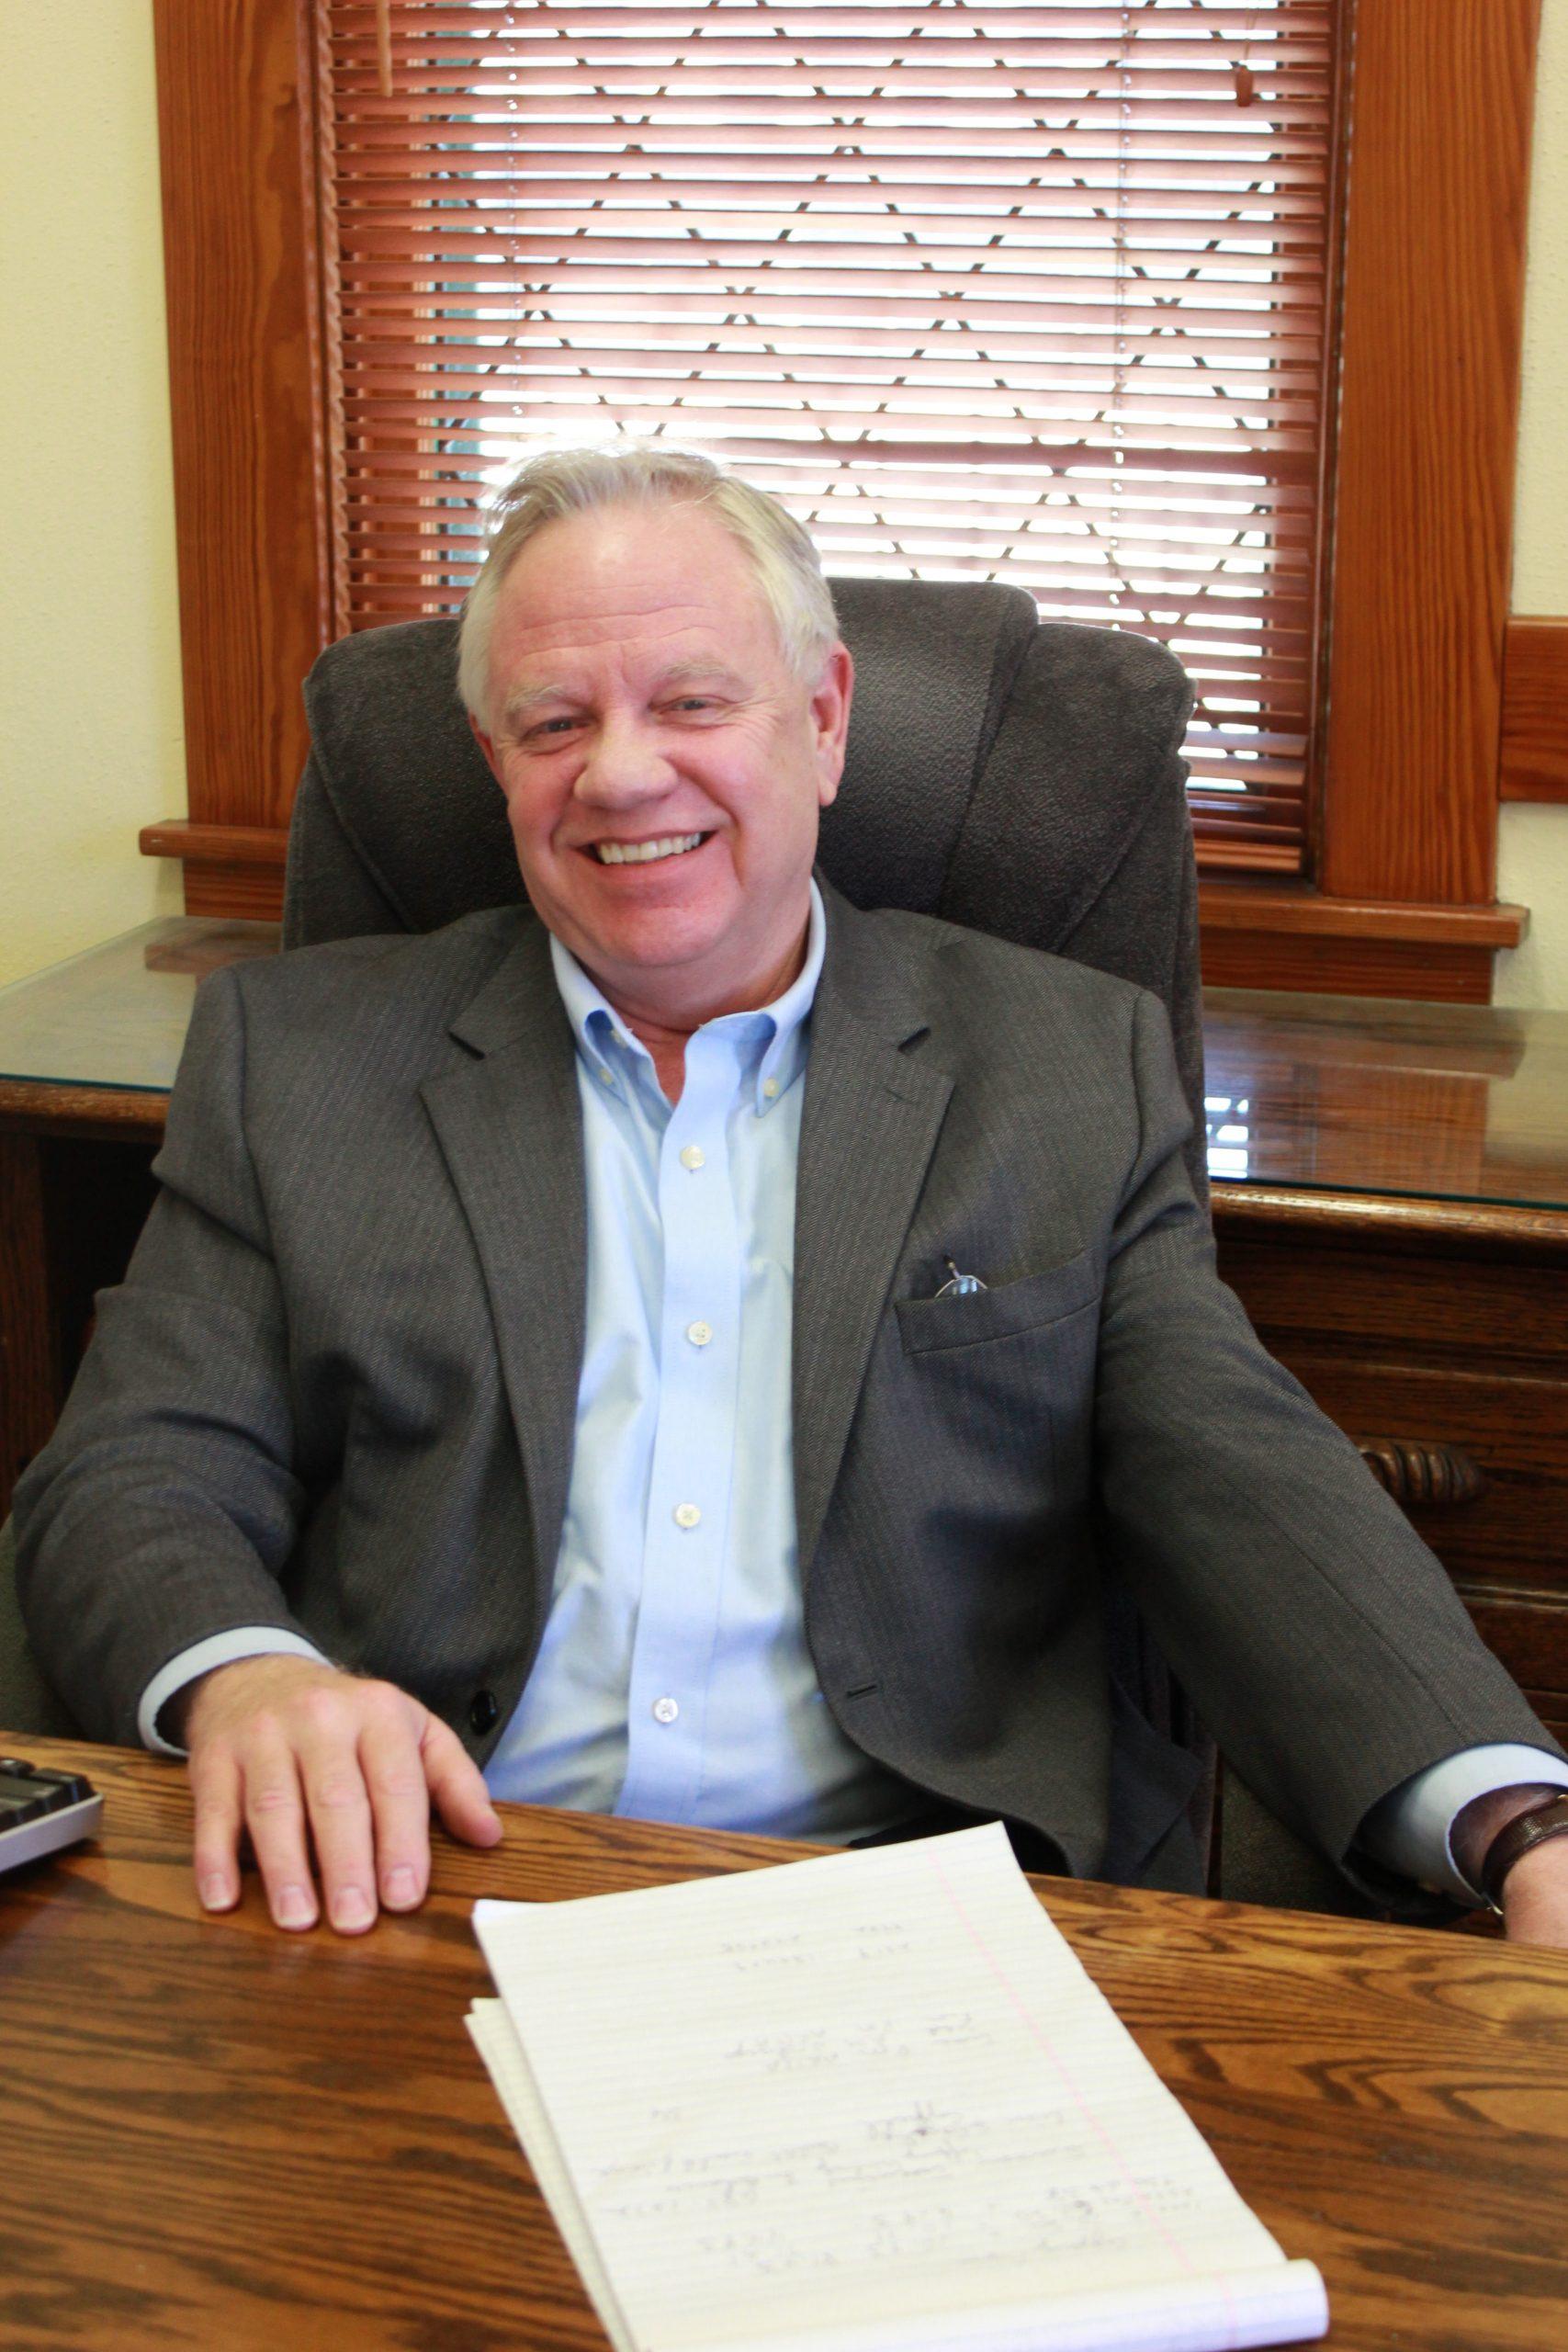 The boss man, John Toohey Executive Director of ARTS SA, is all smiles this season. Photo by Melanie Robinson.